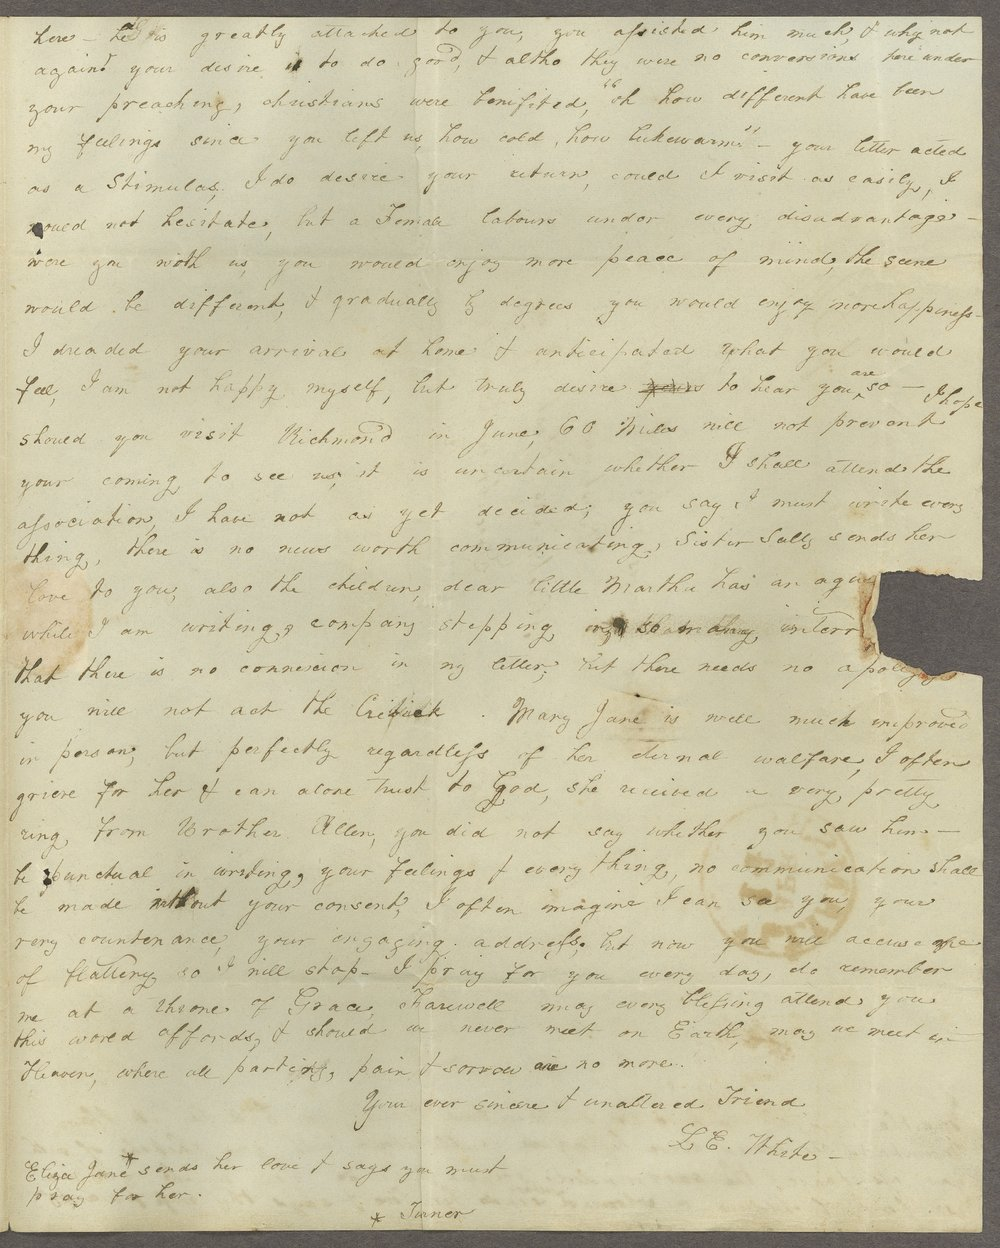 Louisa E. White to Lewis Allen Alderson - 3